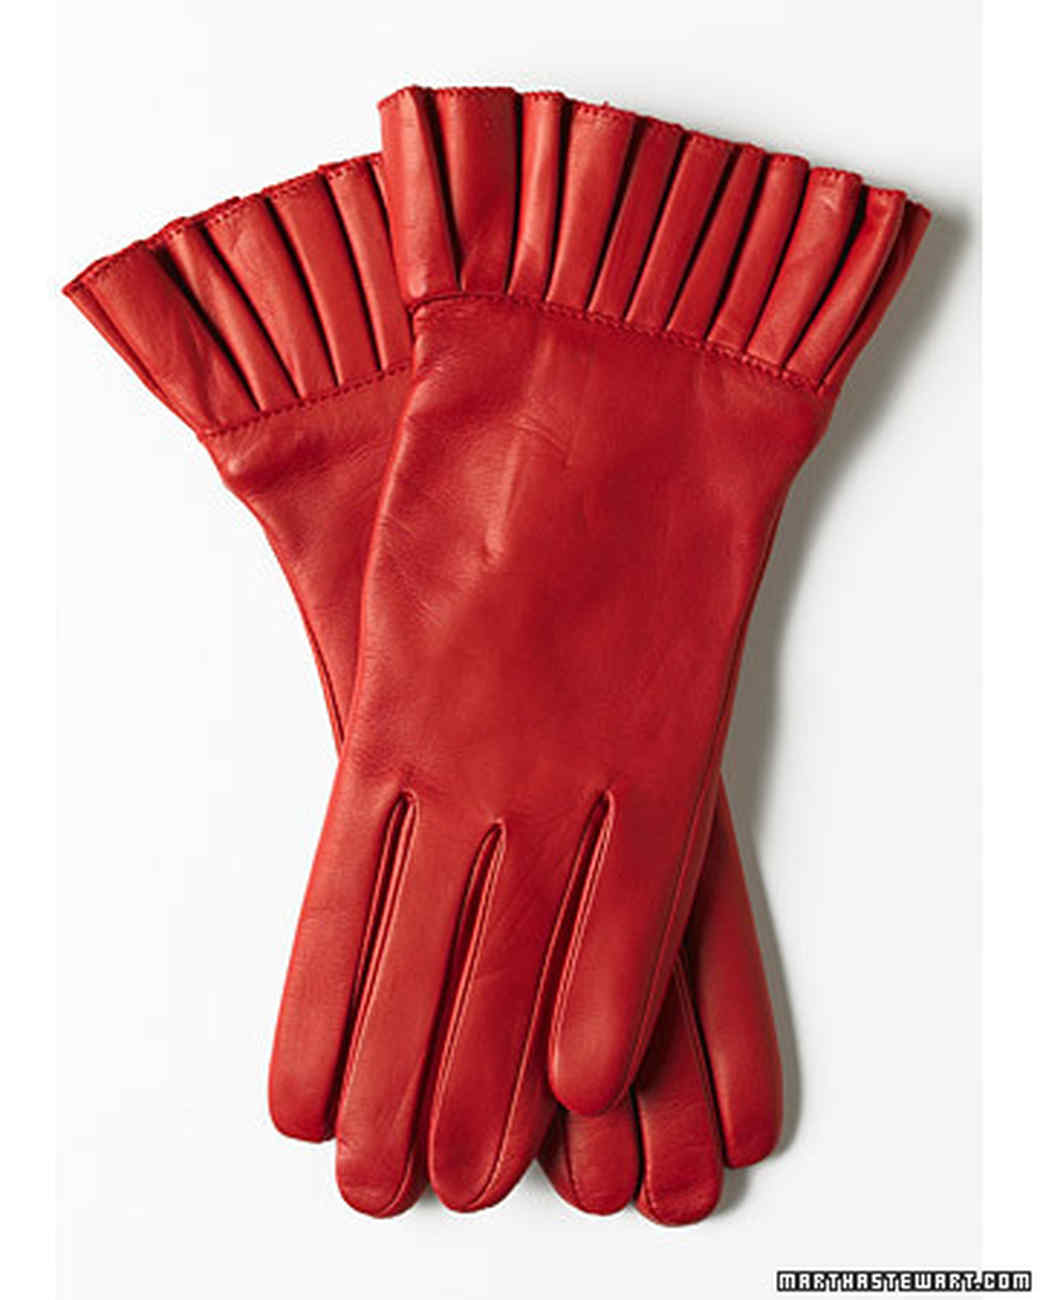 pd103242_0907_pmp_gloves.jpg